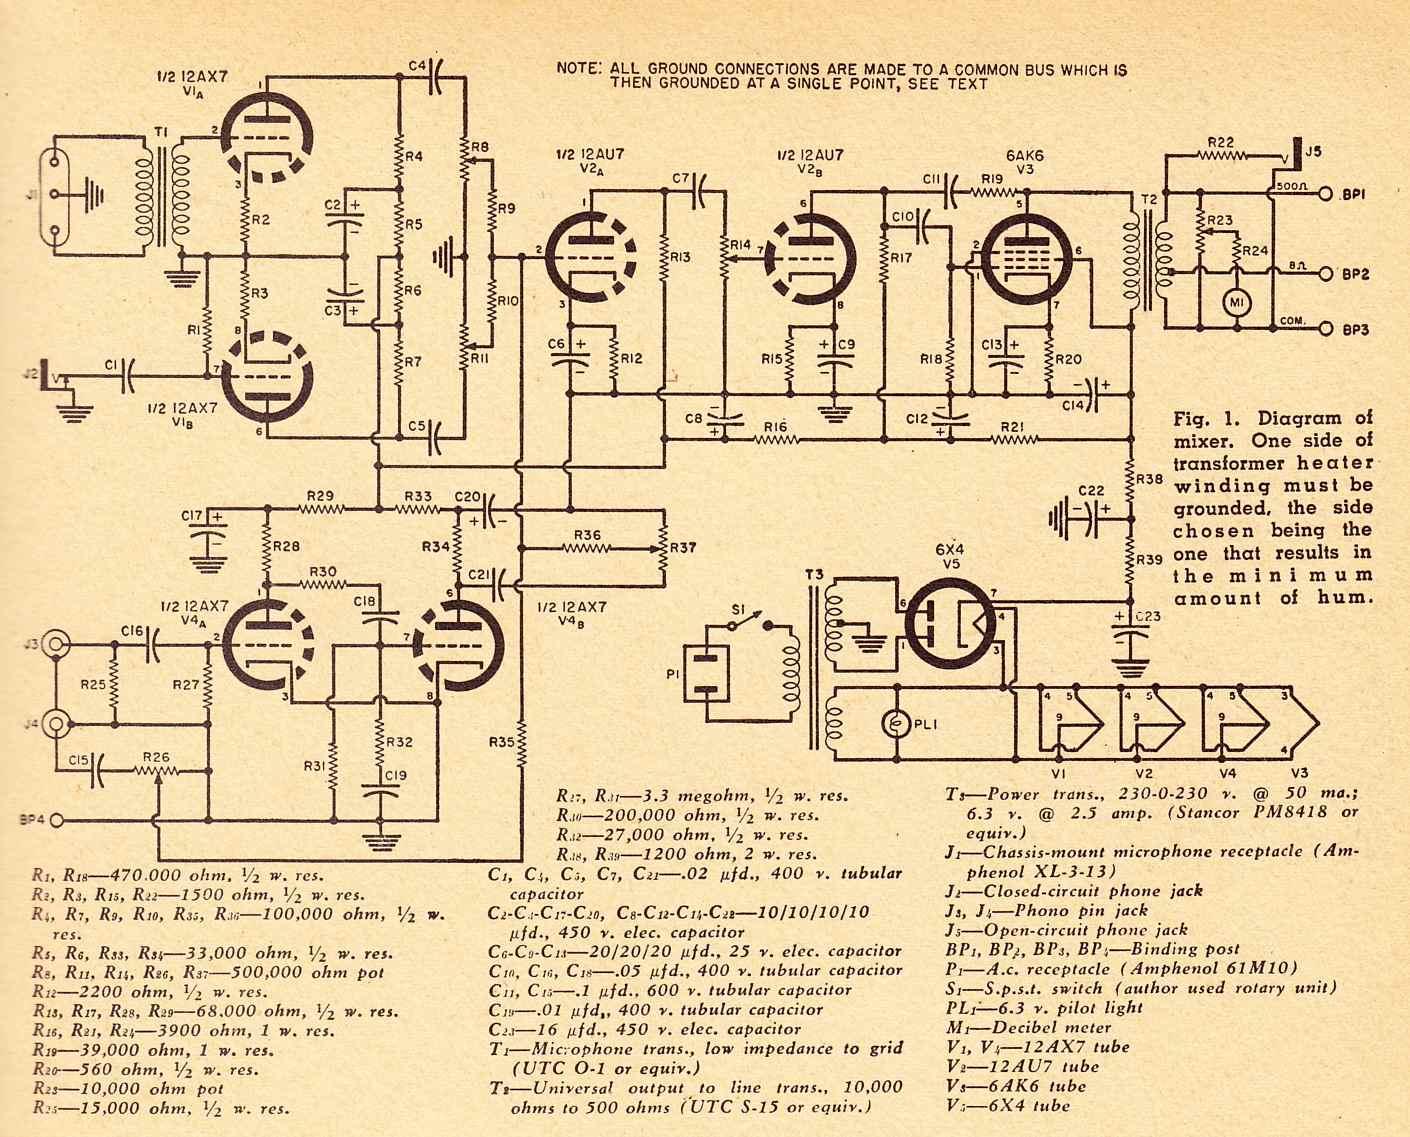 hight resolution of 92 nissan sentra wiring diagram imhddms11net altst inhibitor old house wiring http wwwshaggybevocom board showthreadphp 84250